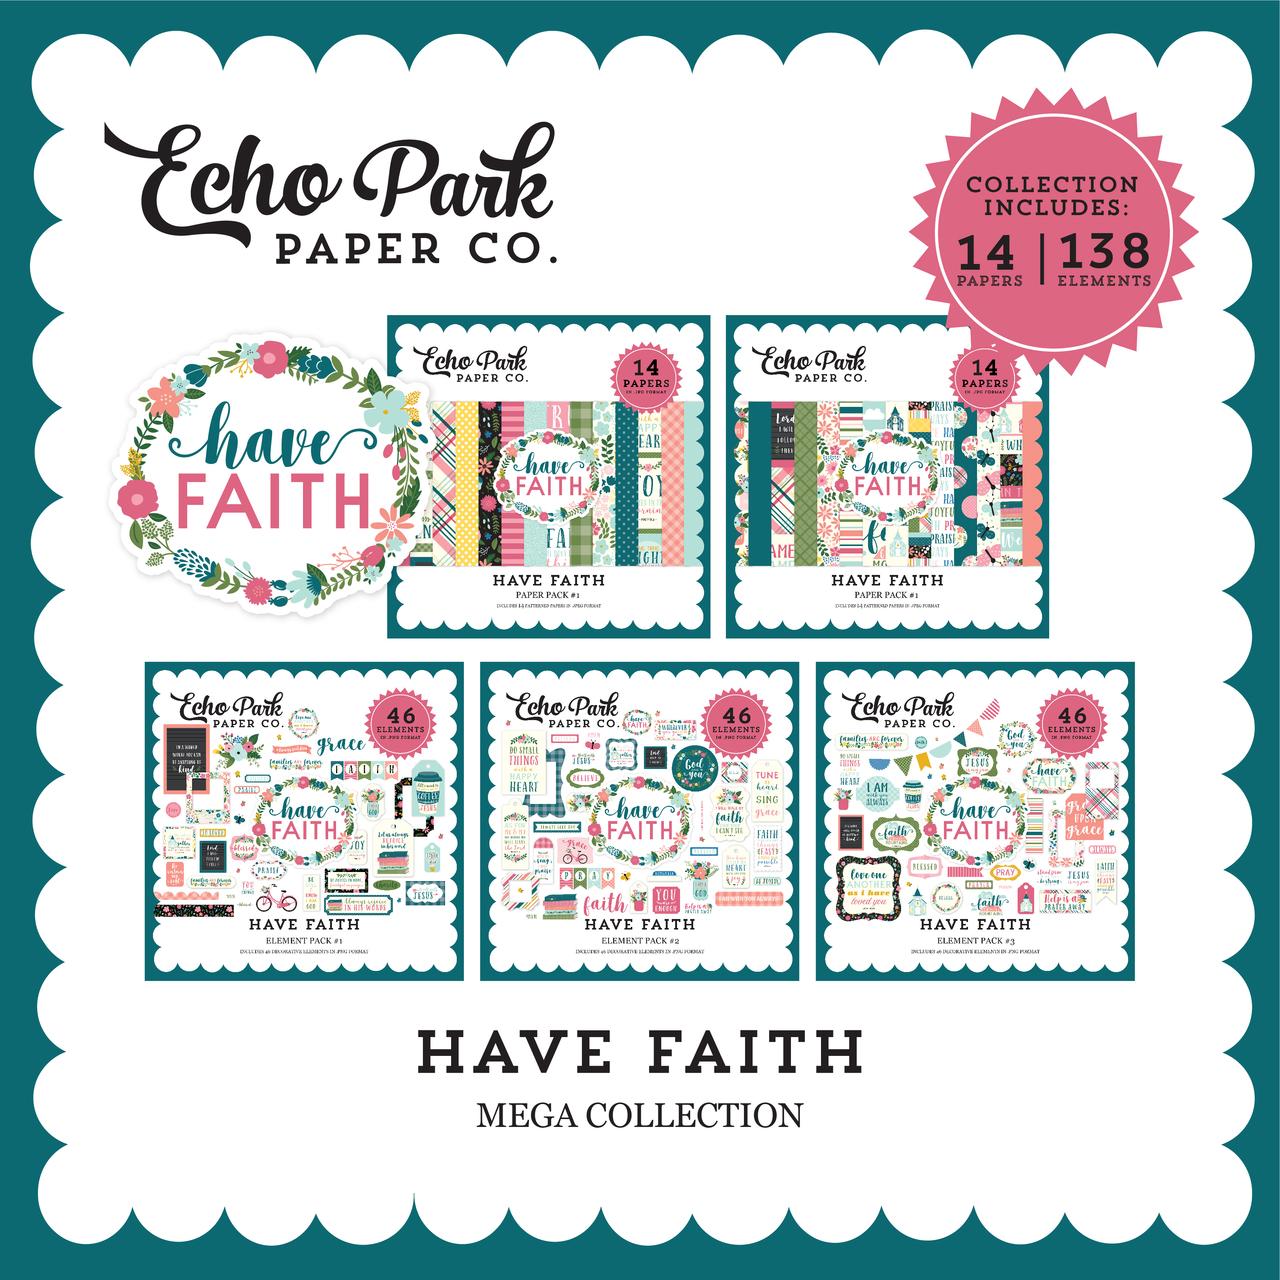 Have Faith Mega Collection